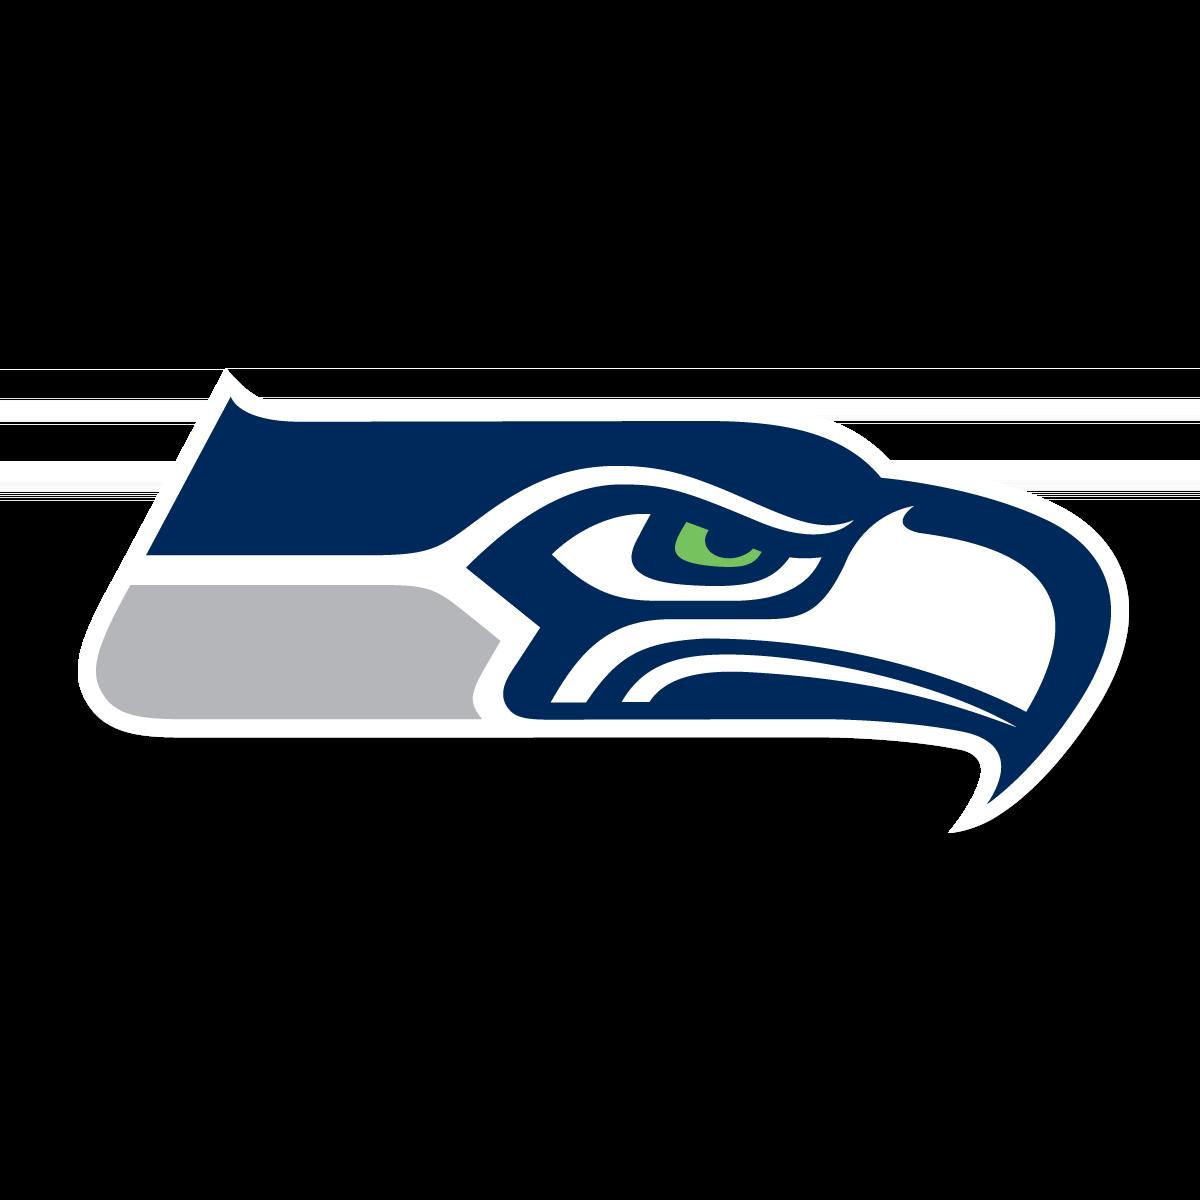 Group Seats Seattle Seahawks 1200x1200